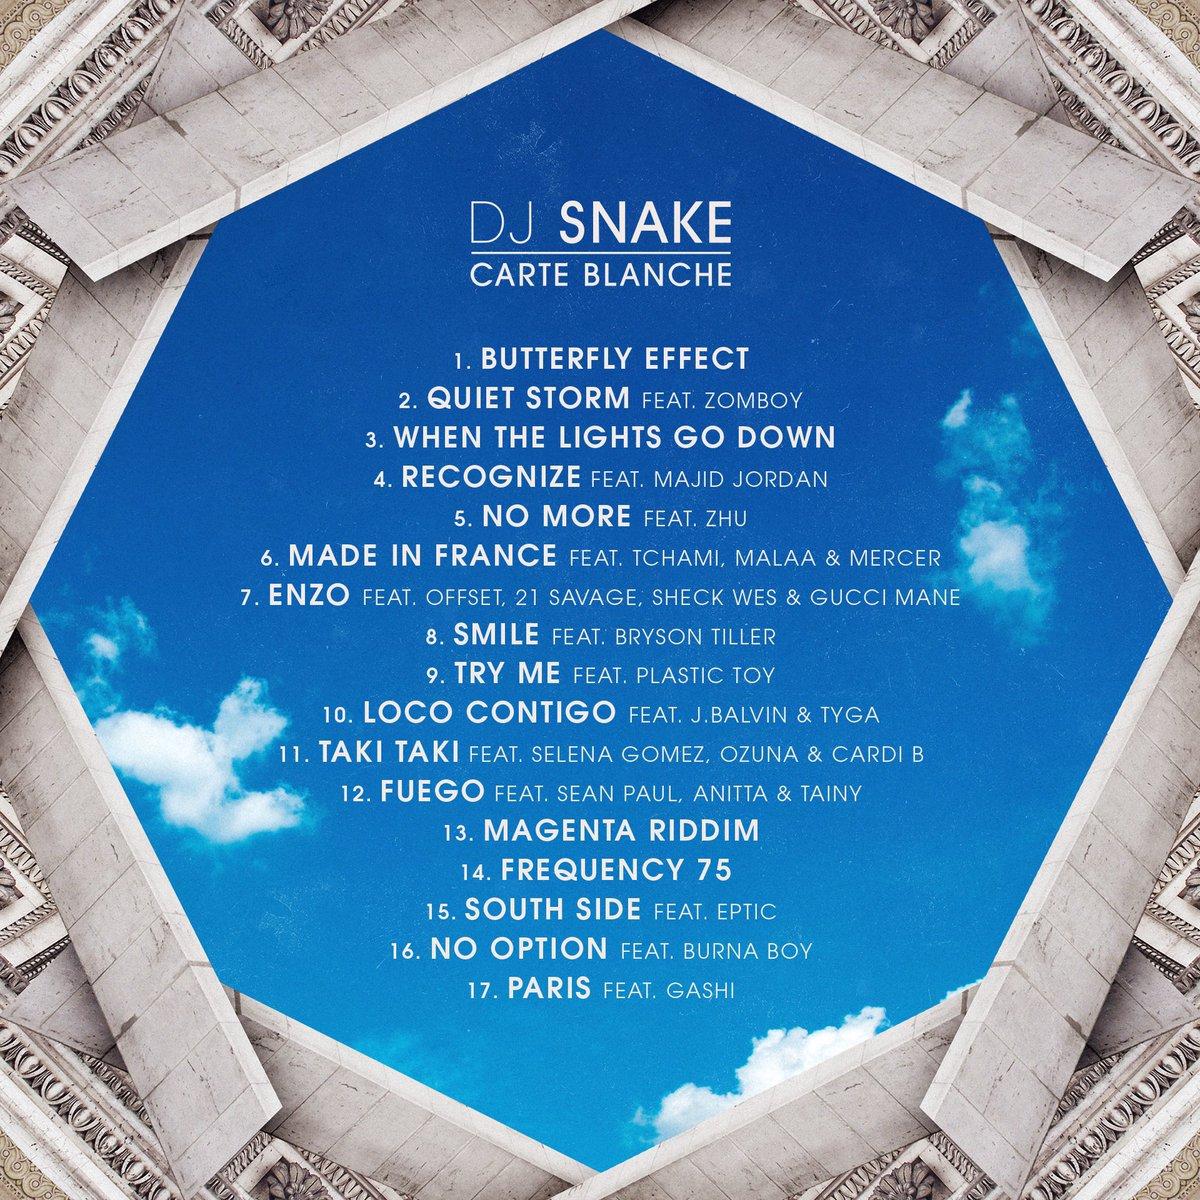 dj snake carte blanche DJ SNAKE on Twitter: